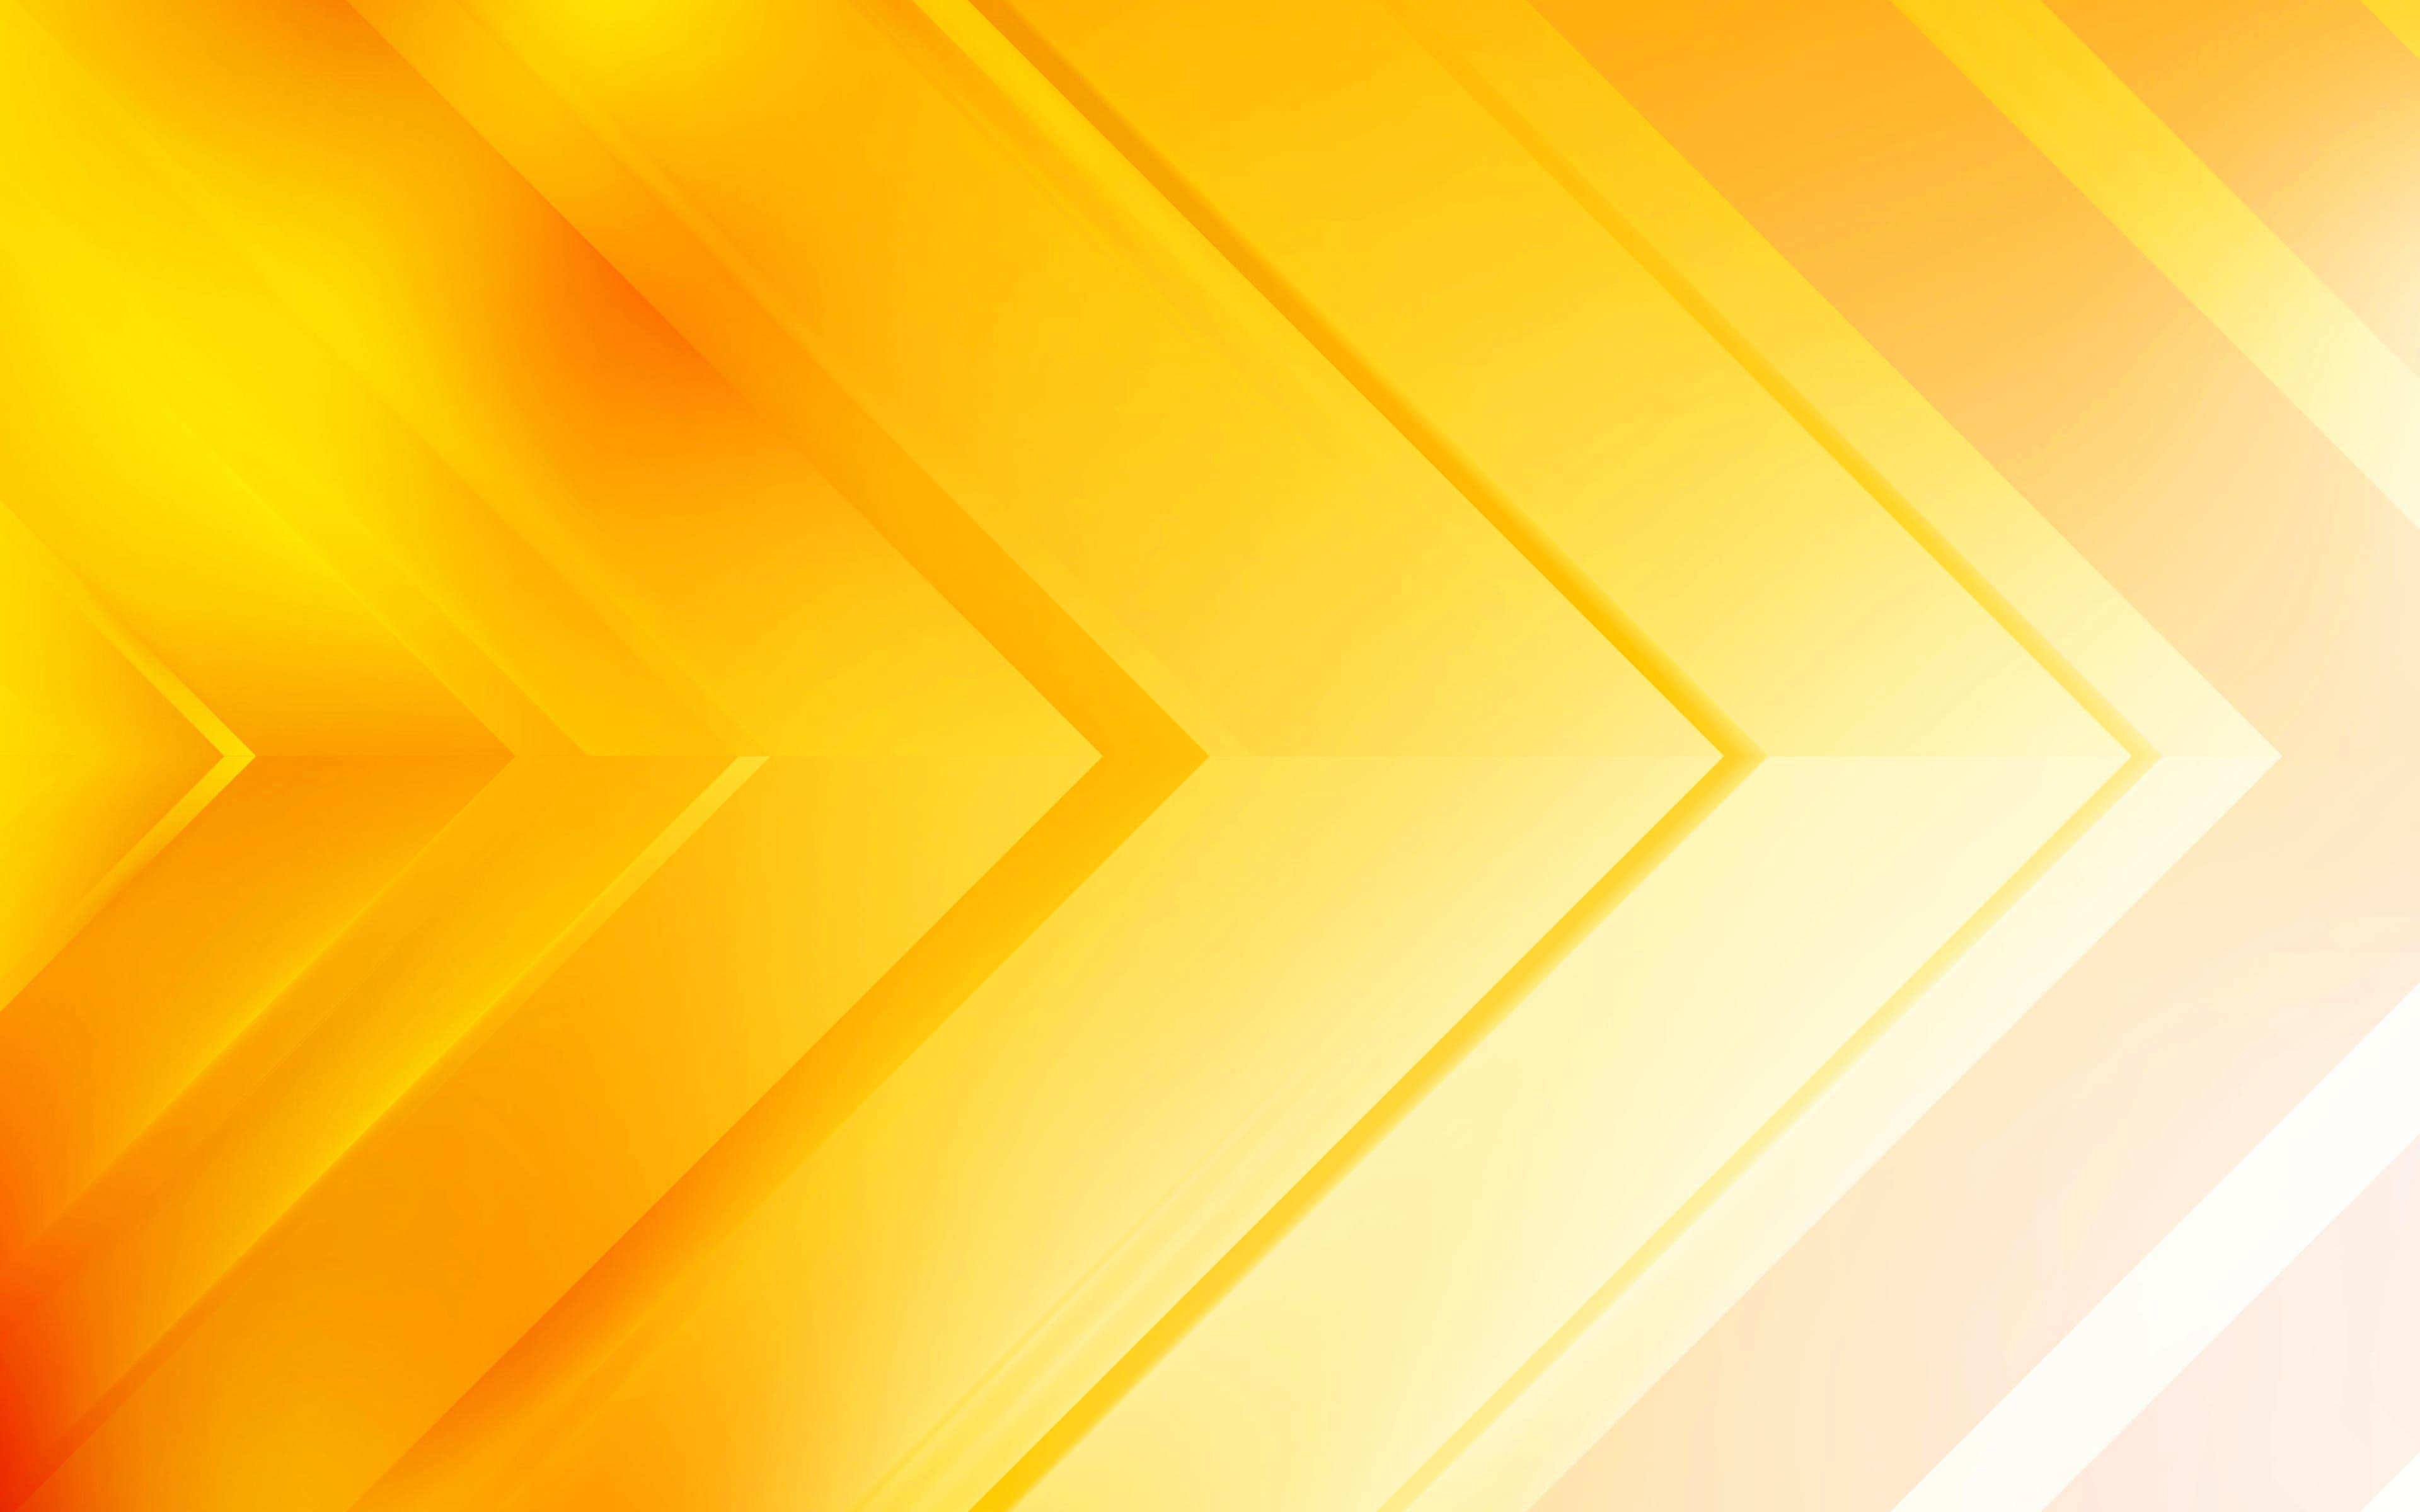 Background Evotor 7.3